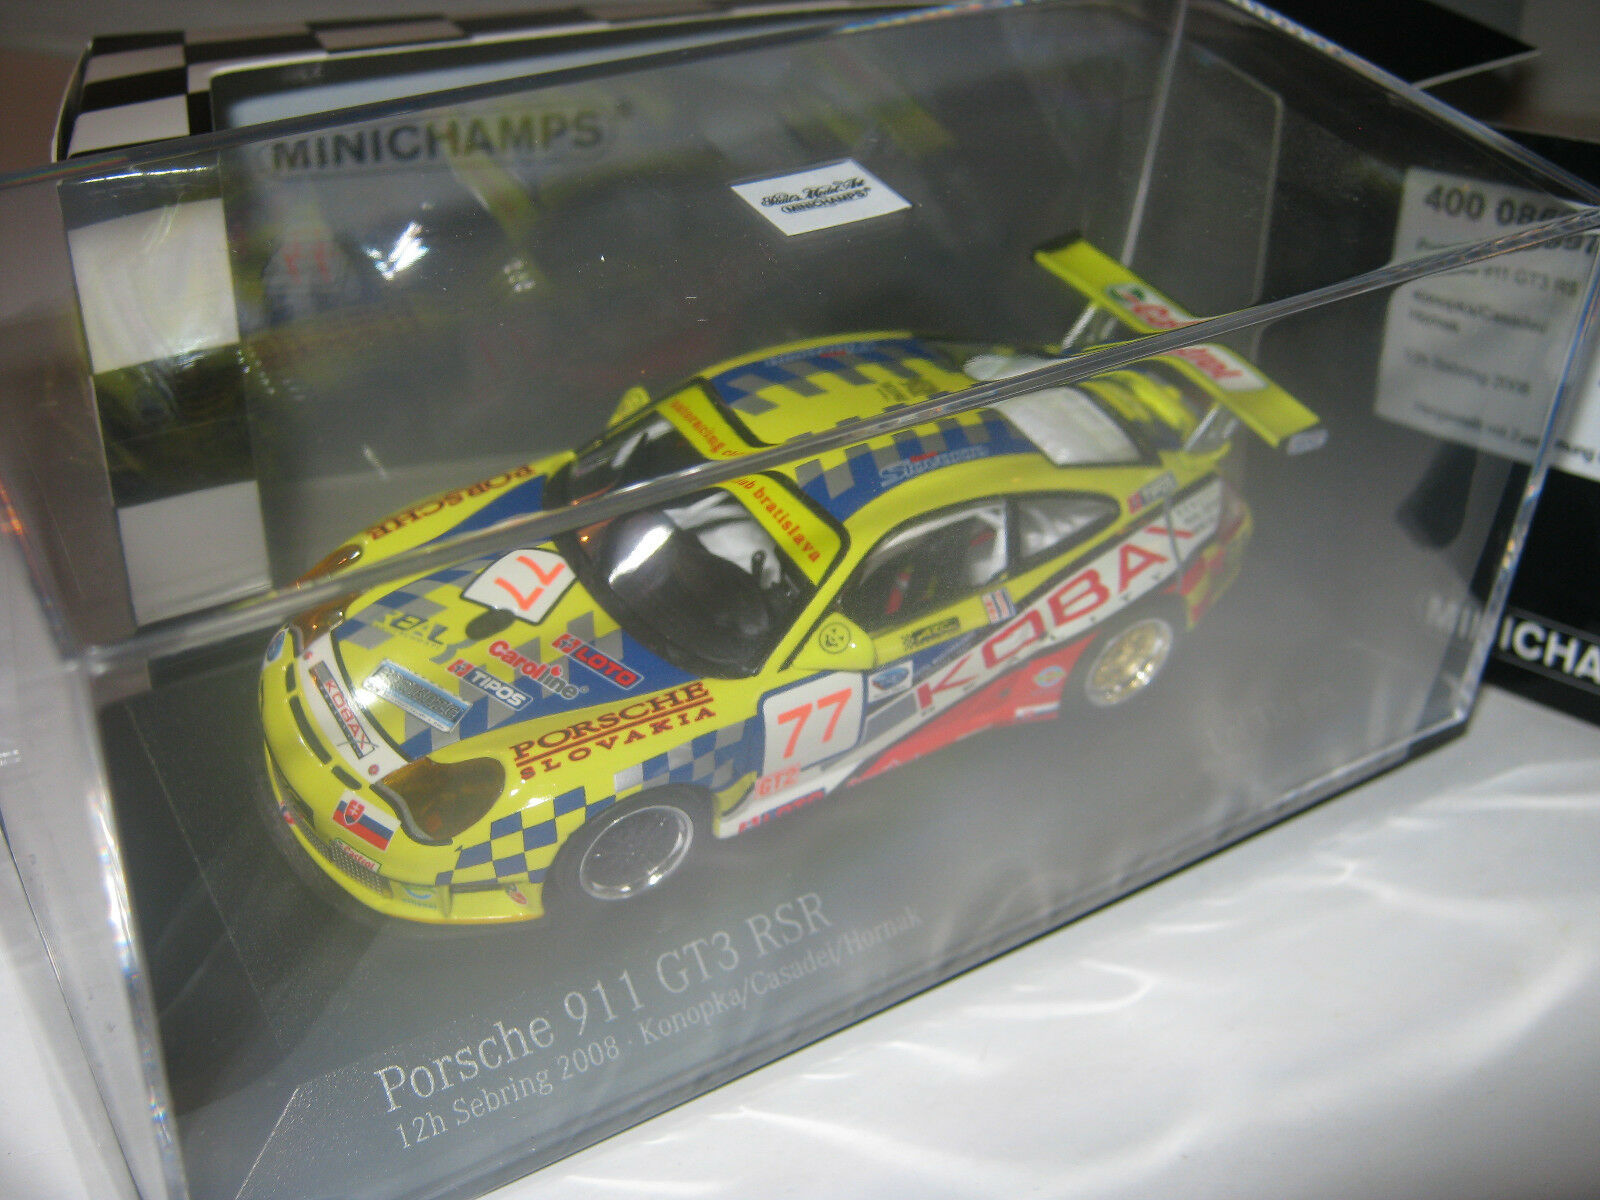 1 43 Porsche 911 gt3rs konopka 2008 Minichamps 400086977 New L.E. 1 of 336